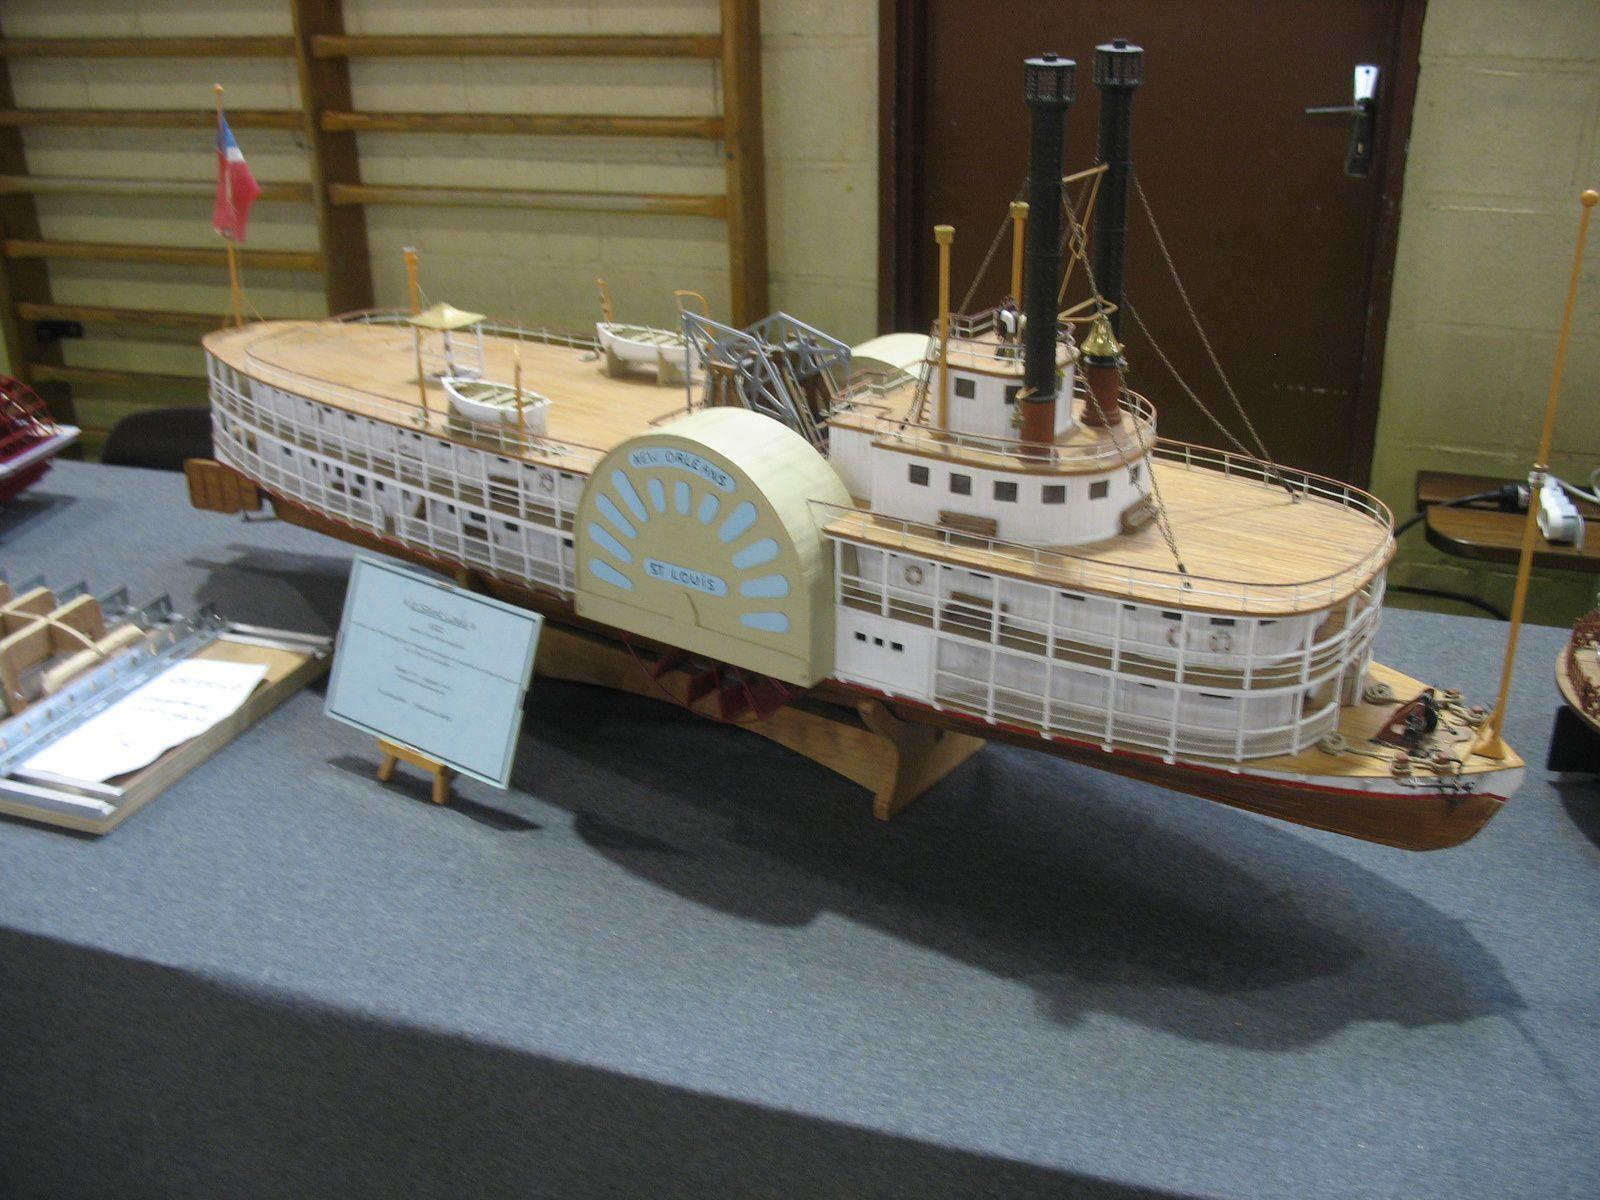 Exposition d'Orléans 2015